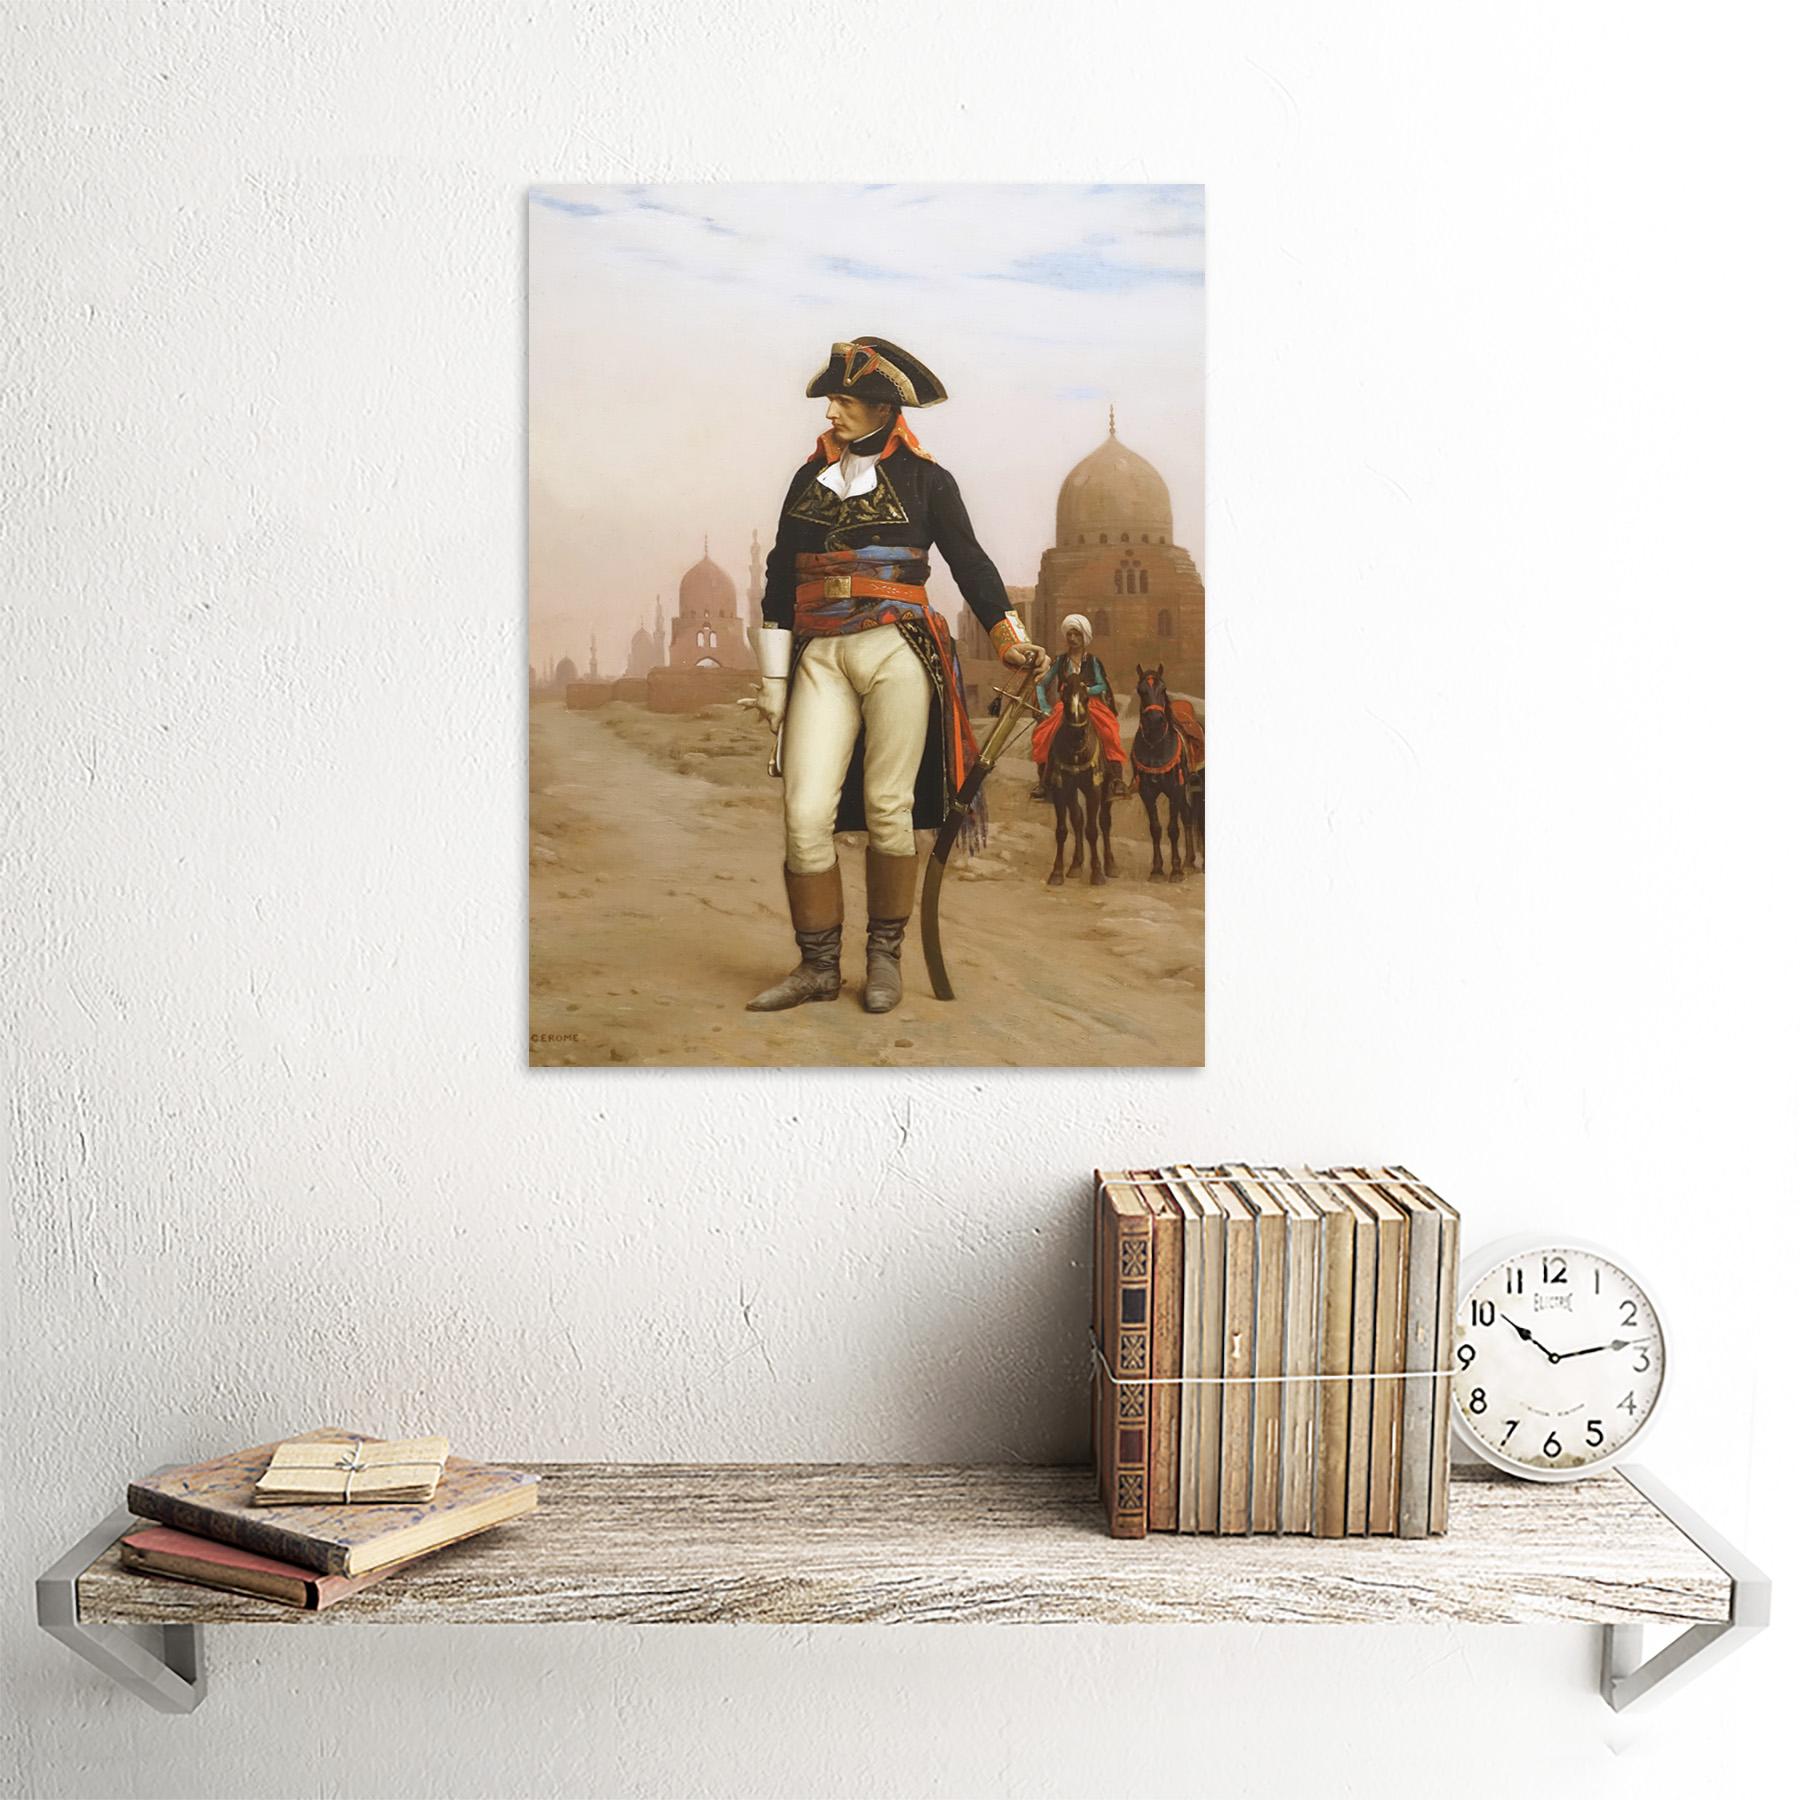 Gerome-Napoleon-Bonaparte-In-Egypt-Painting-Art-Print-Framed-12x16 thumbnail 23